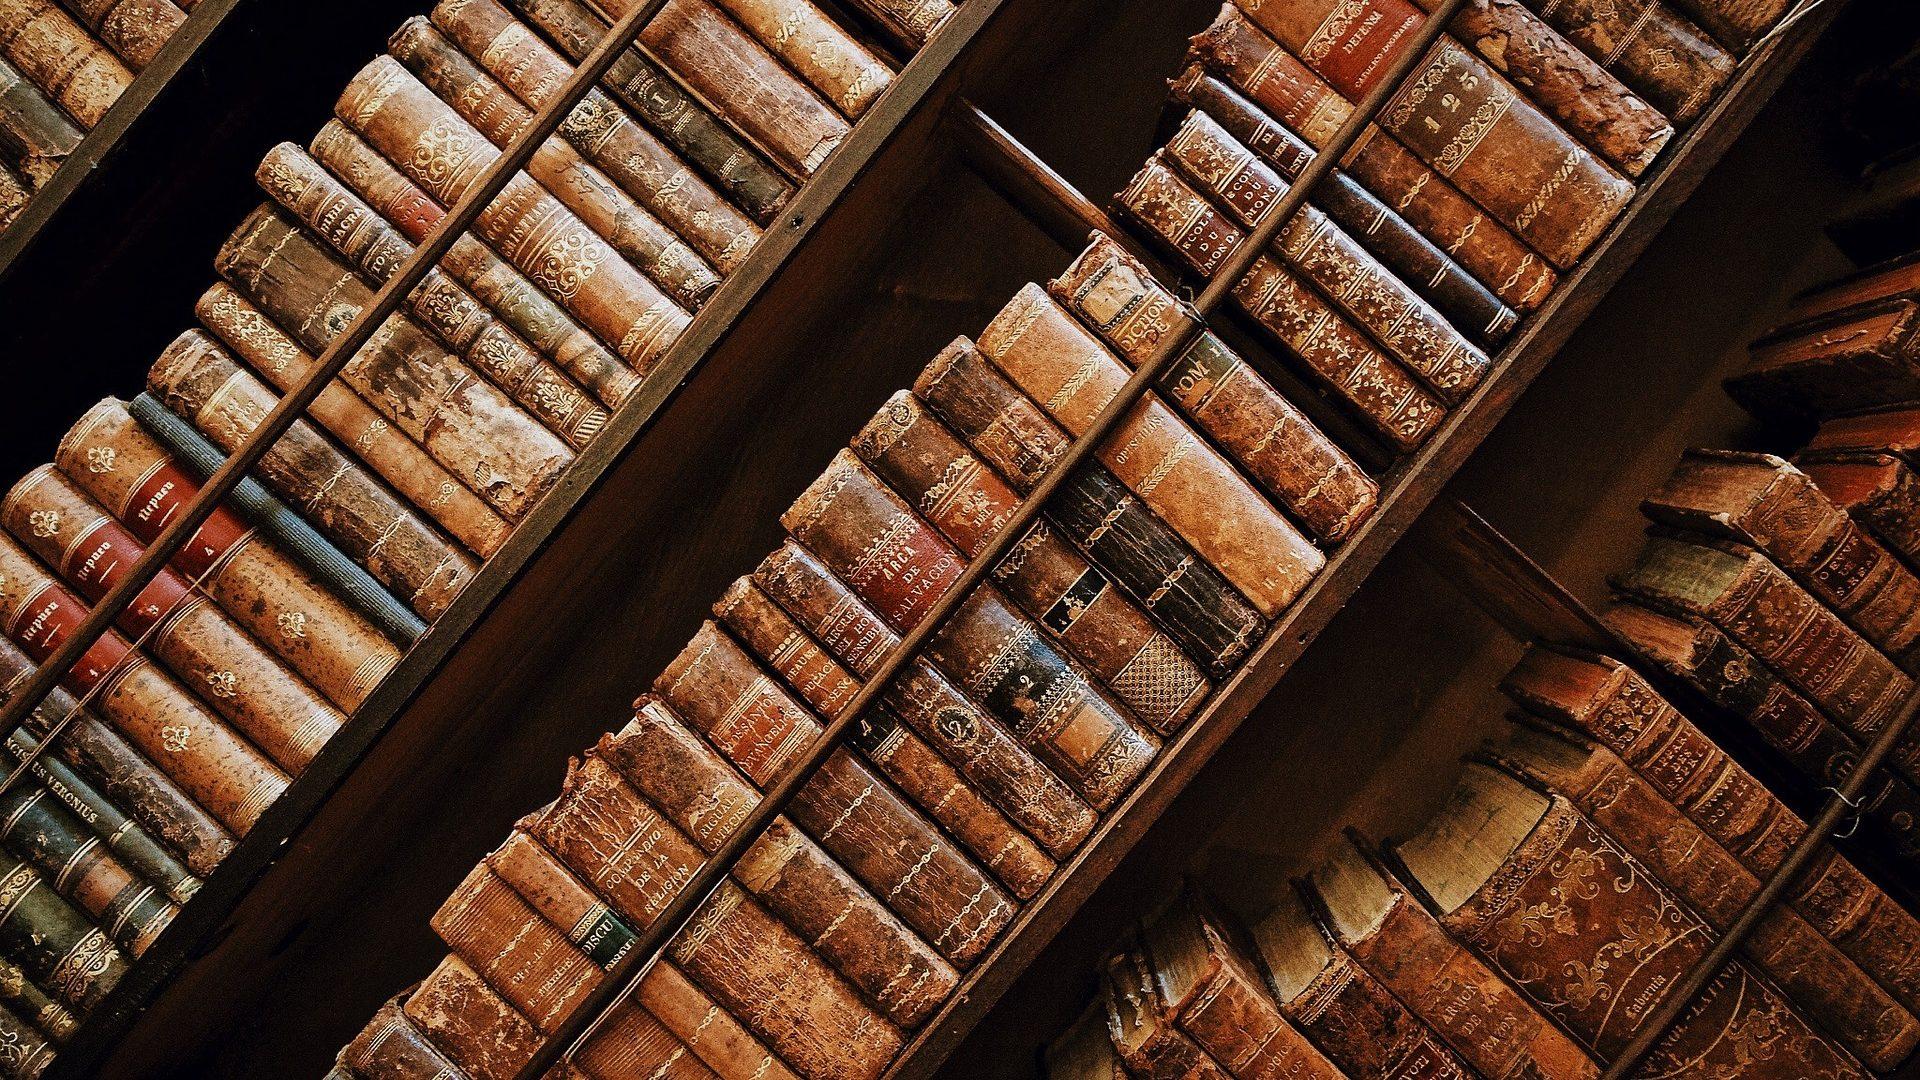 Image: Leather-bound books on a slanted shelf